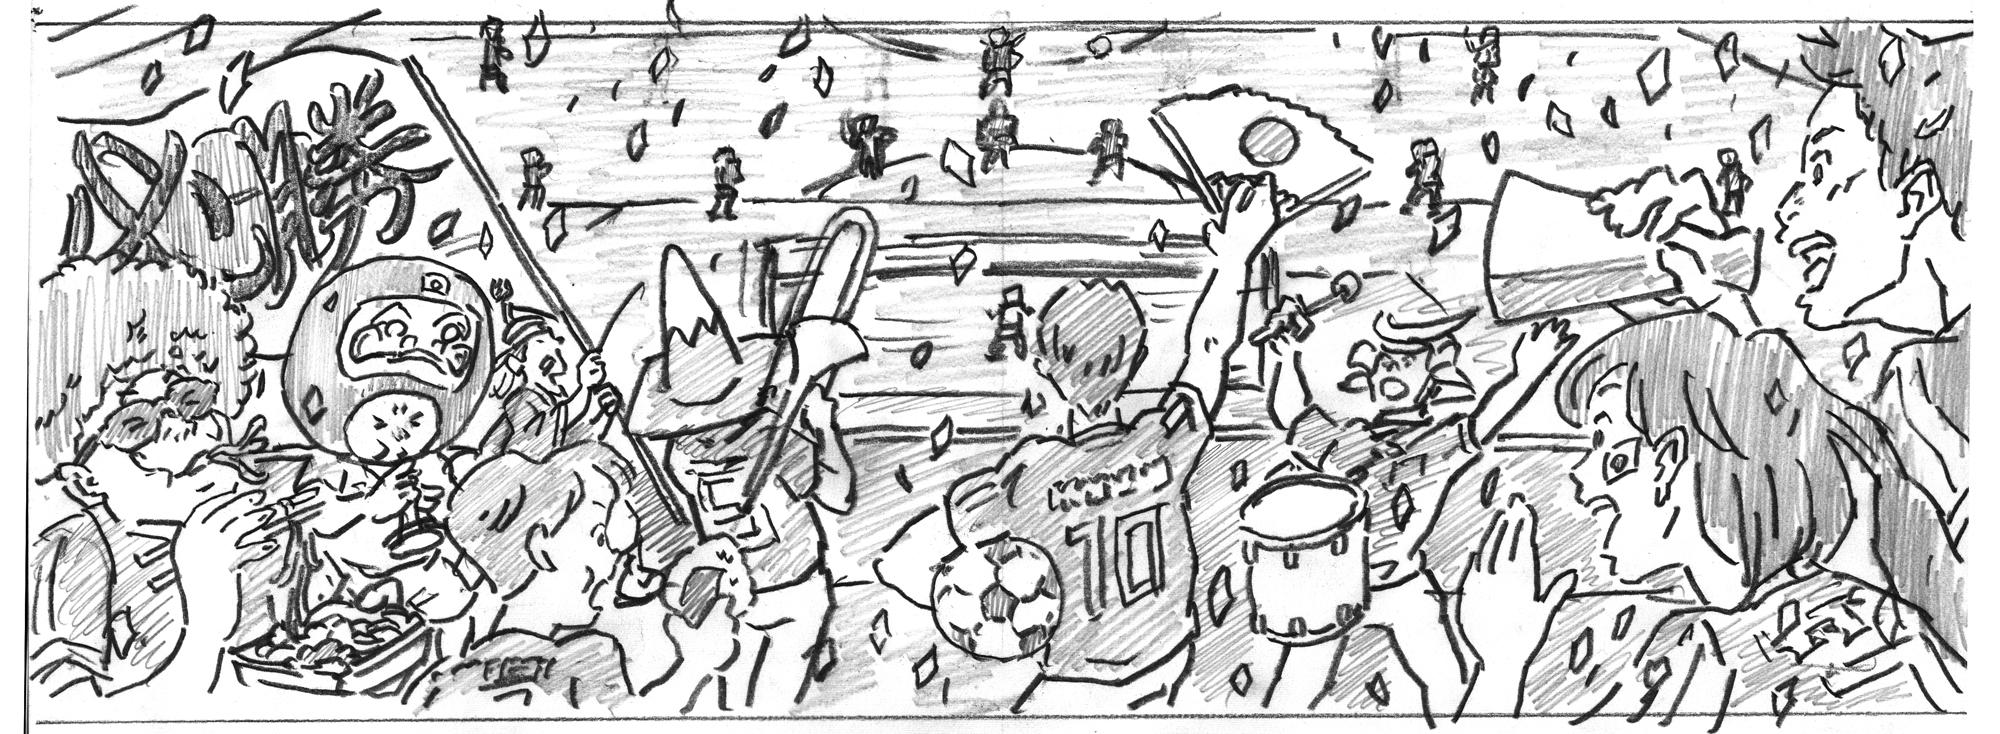 Japan World Cup Doodle Sketch